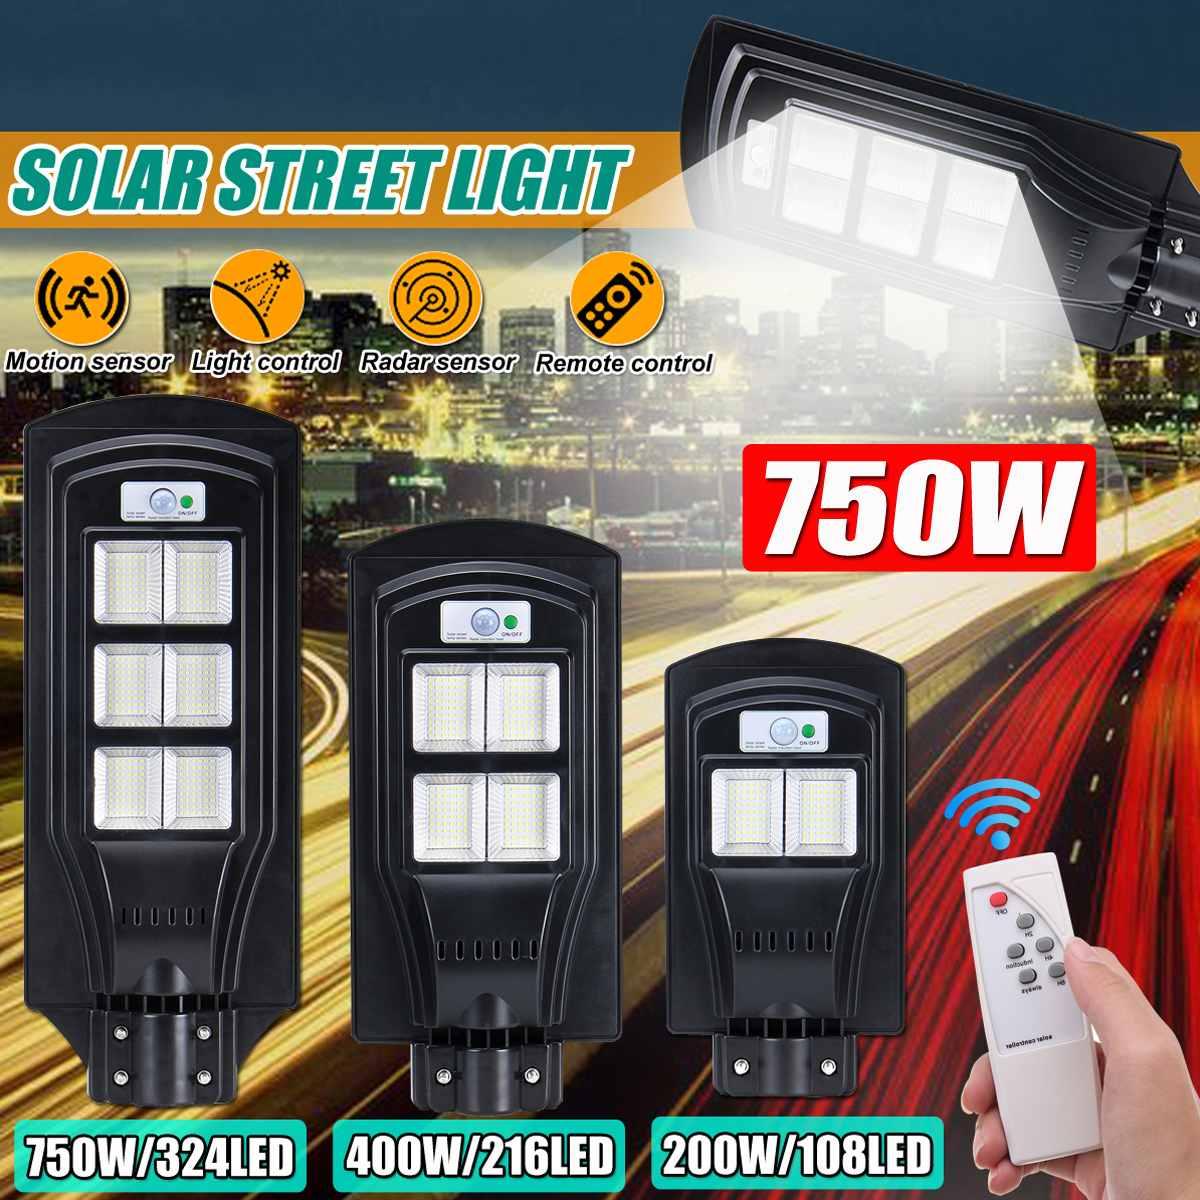 New Led Solar Street Light Waterproof Outdoor Lighting 200W/400W/750W Rador-Motion Wall Light with RC for Garden Yard Plaza